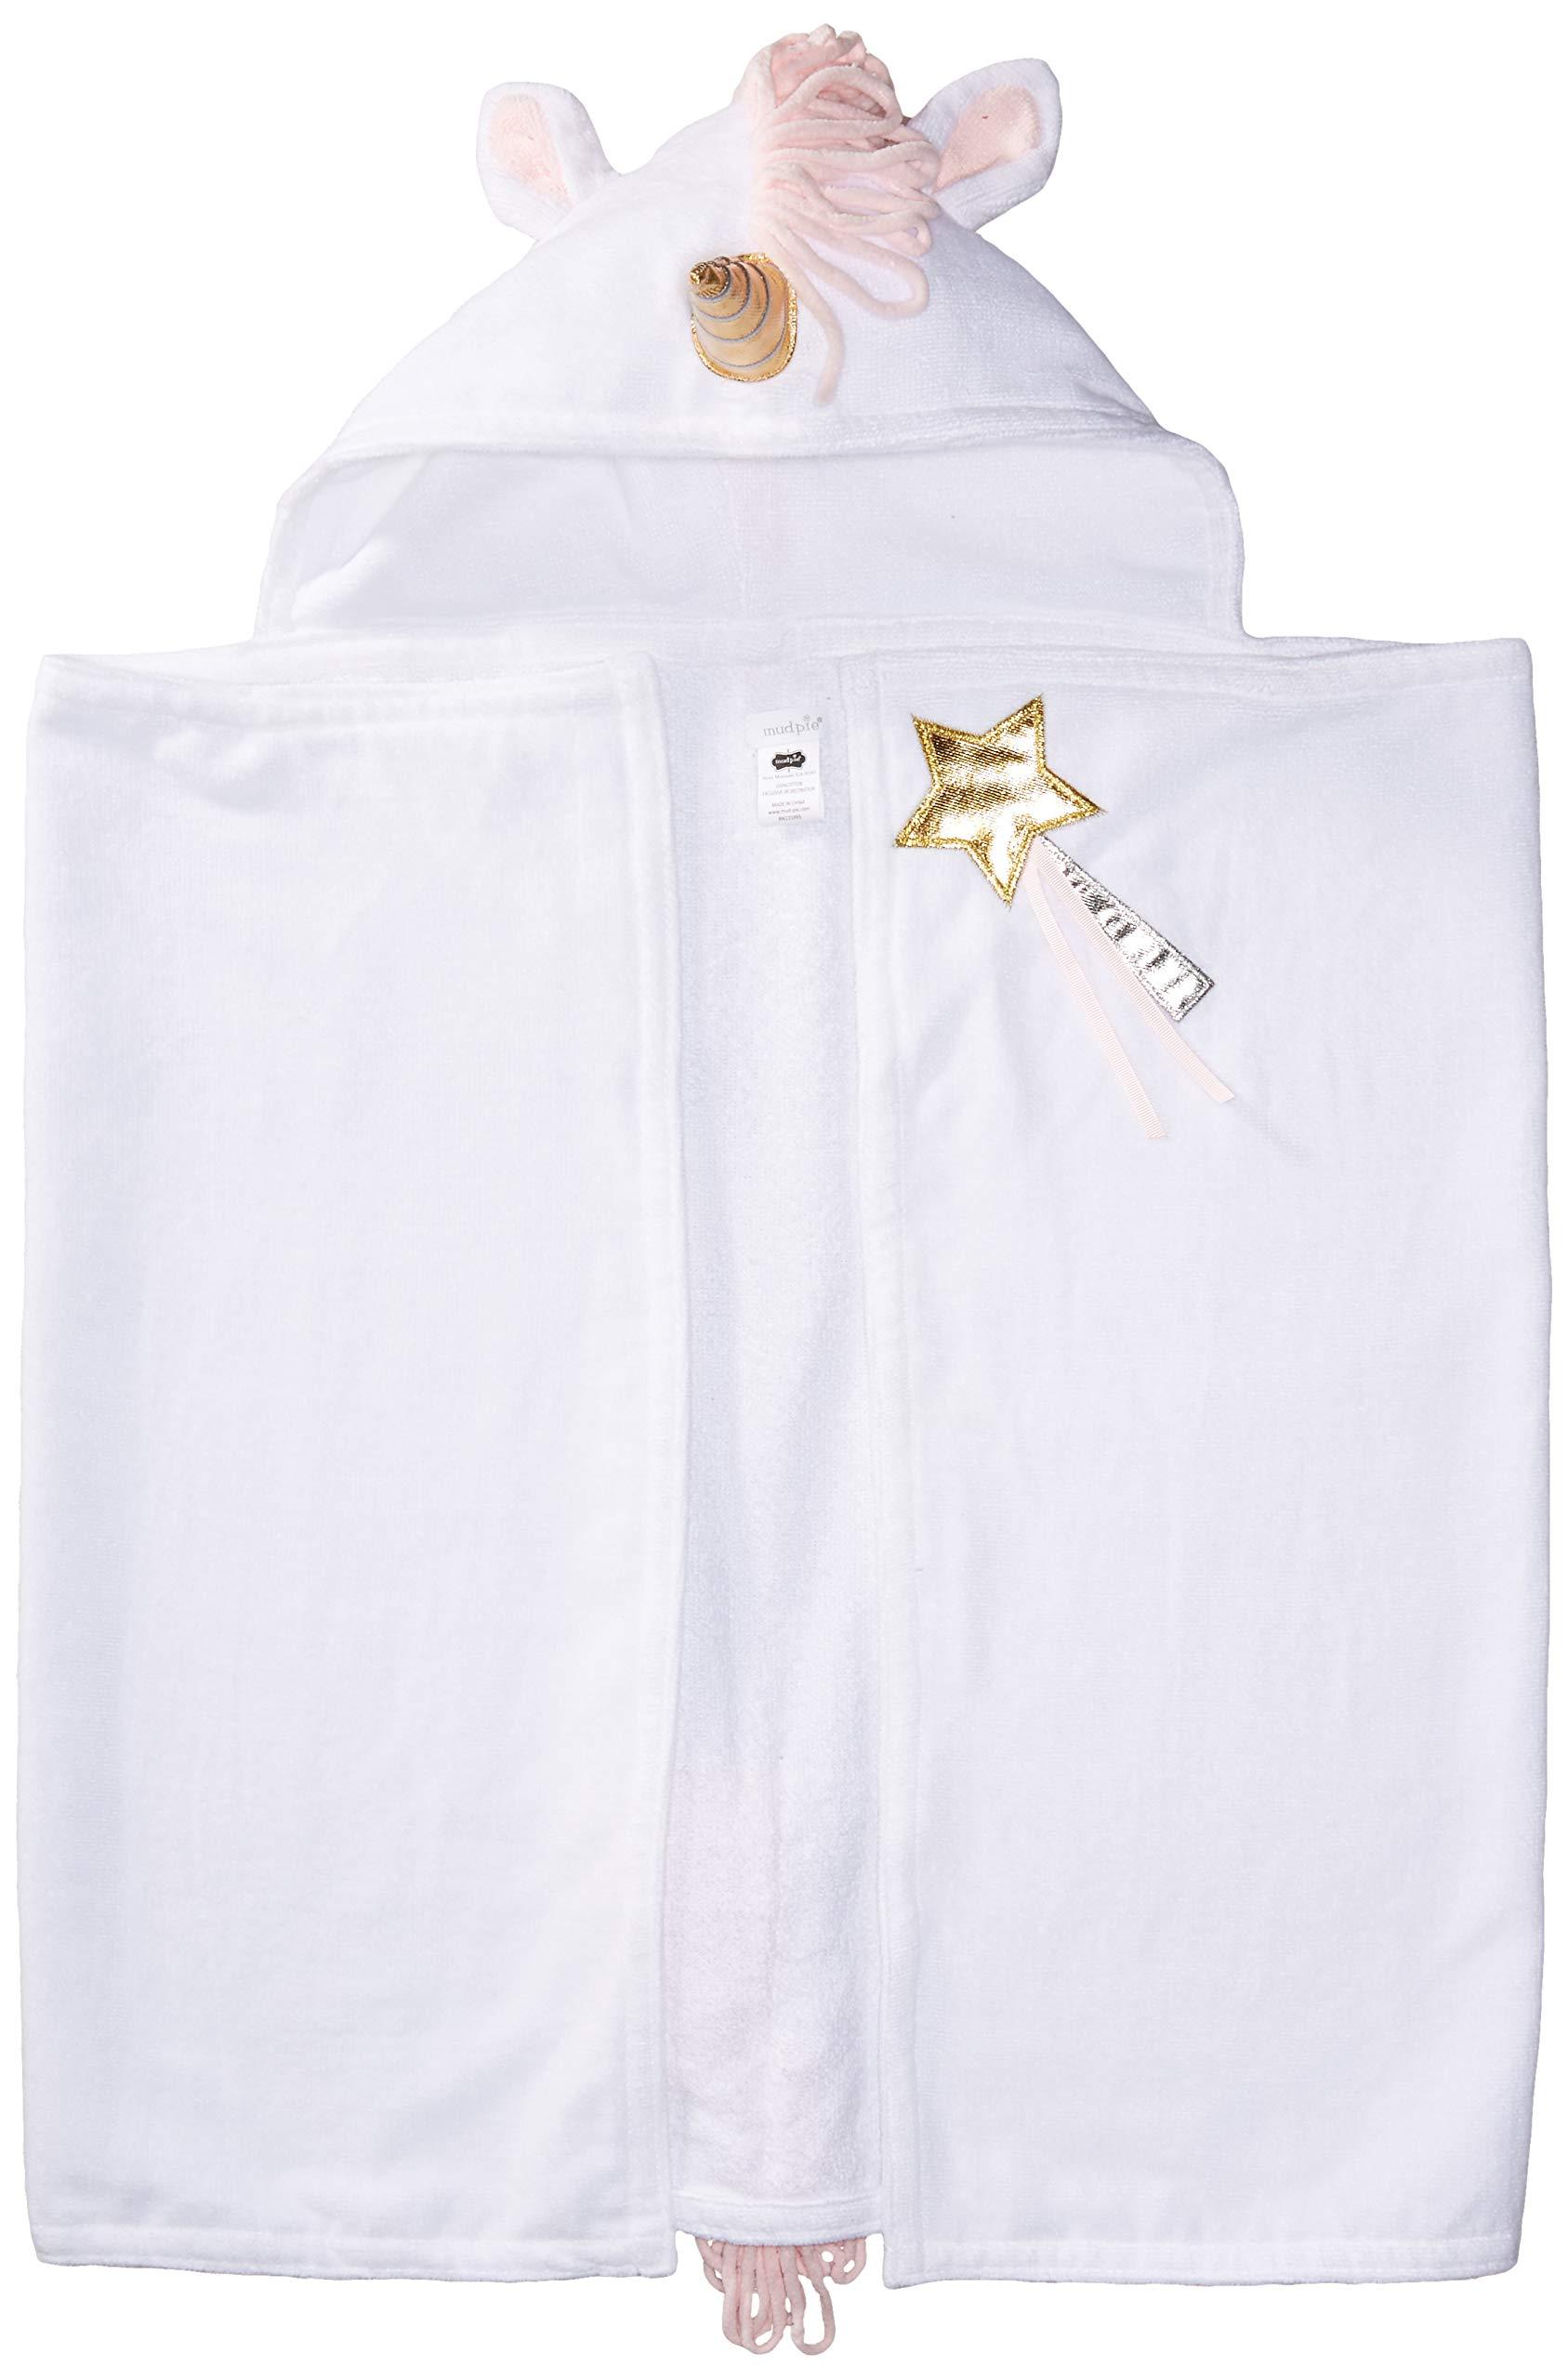 Mud Pie Baby Girls Unicorn Hooded Bath Towel, White, One Size by Mud Pie